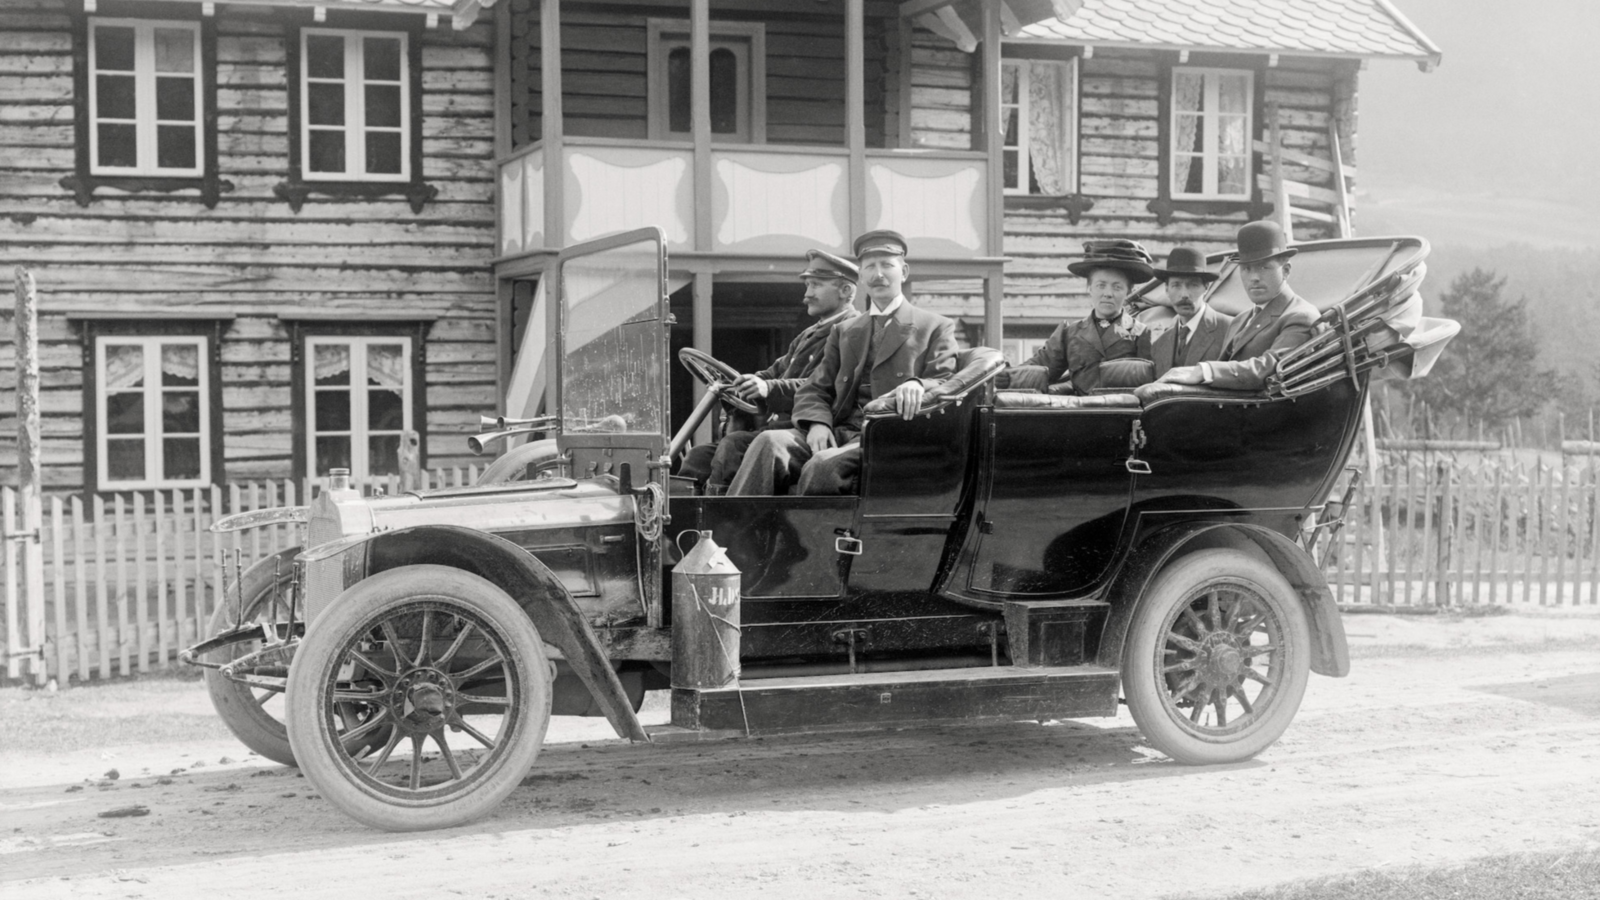 Historisk foto av en gammeldags bil med fem personer i.